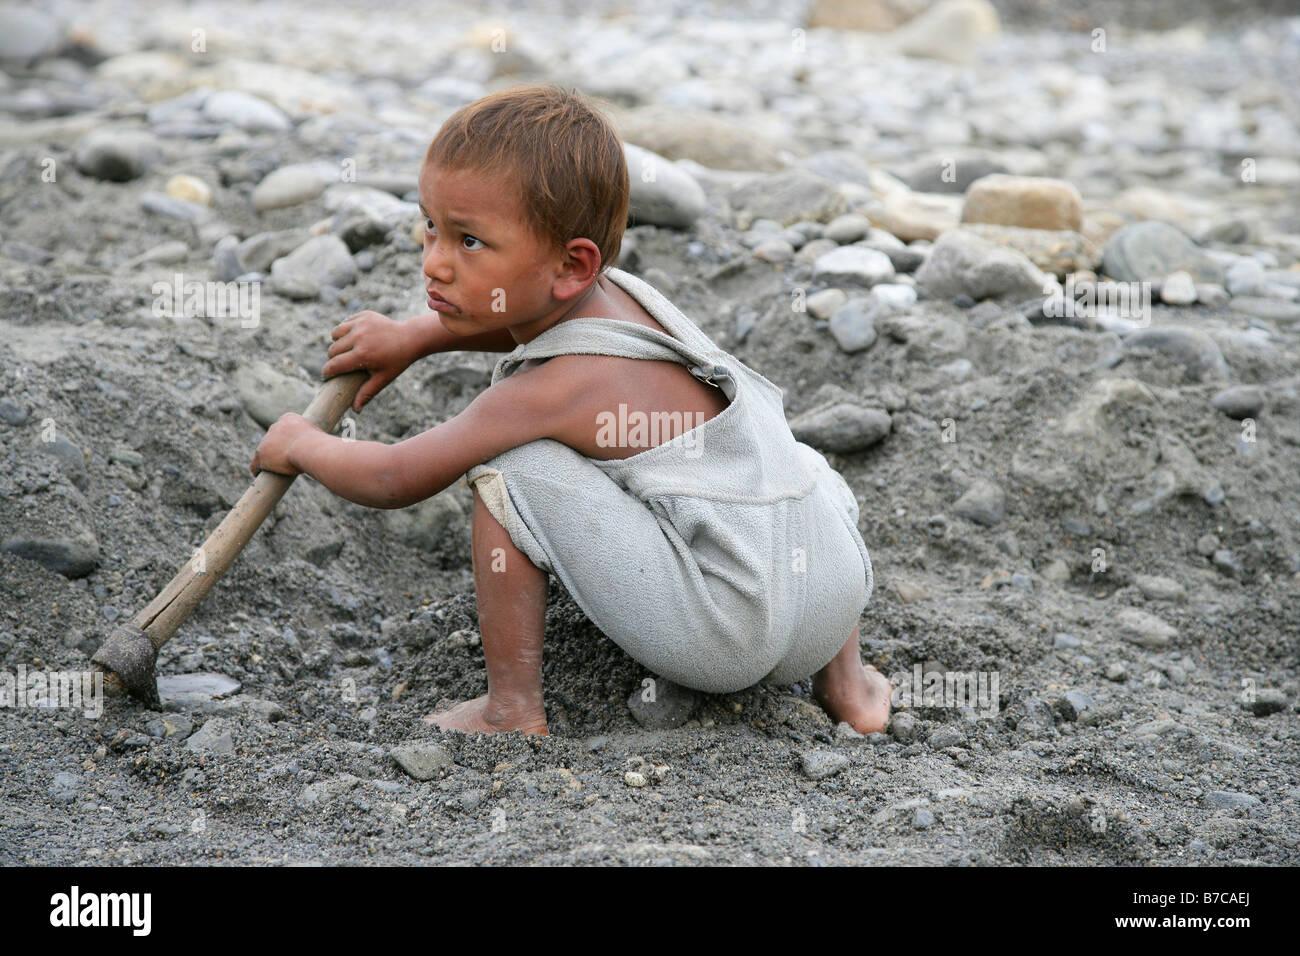 Child Labour Nepal Stock Photos Amp Child Labour Nepal Stock